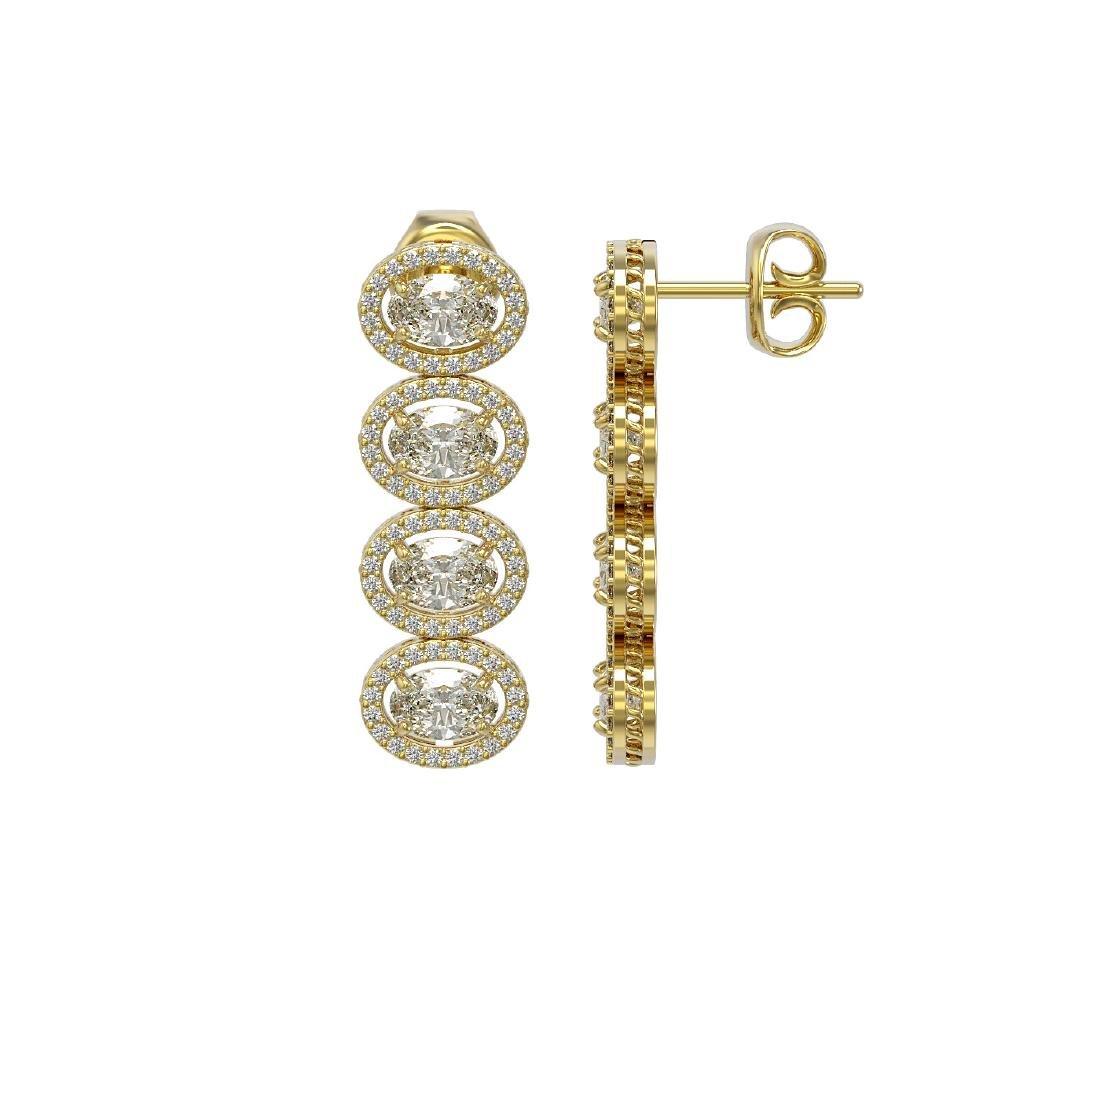 5.33 CTW Oval Diamond Designer Earrings 18K Yellow Gold - 2